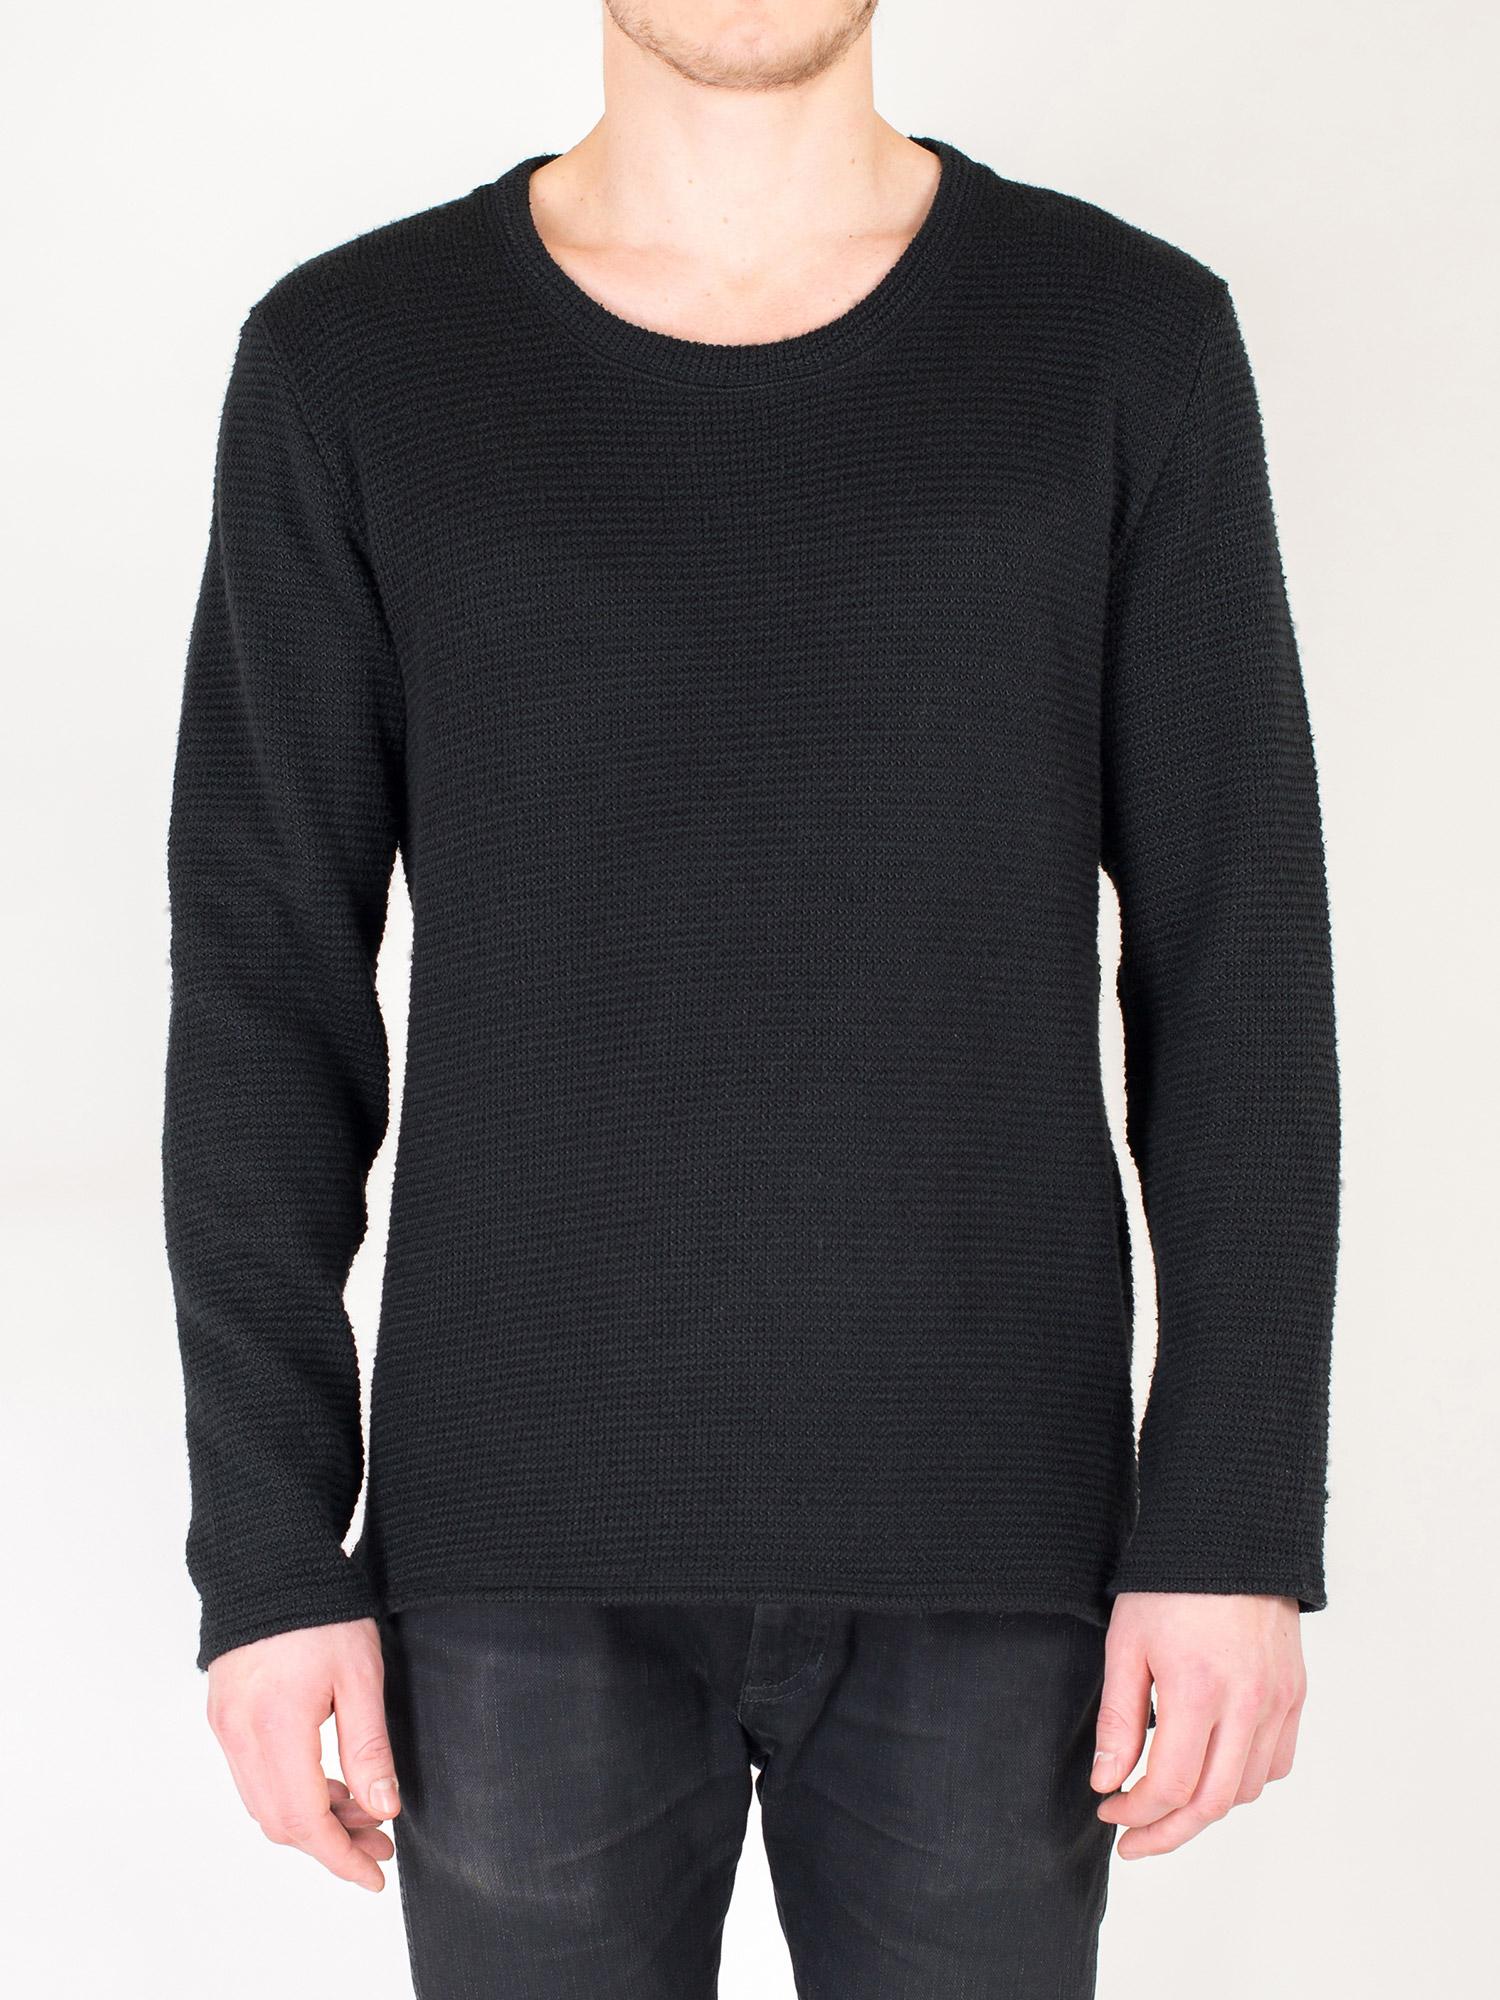 Grey-black-front